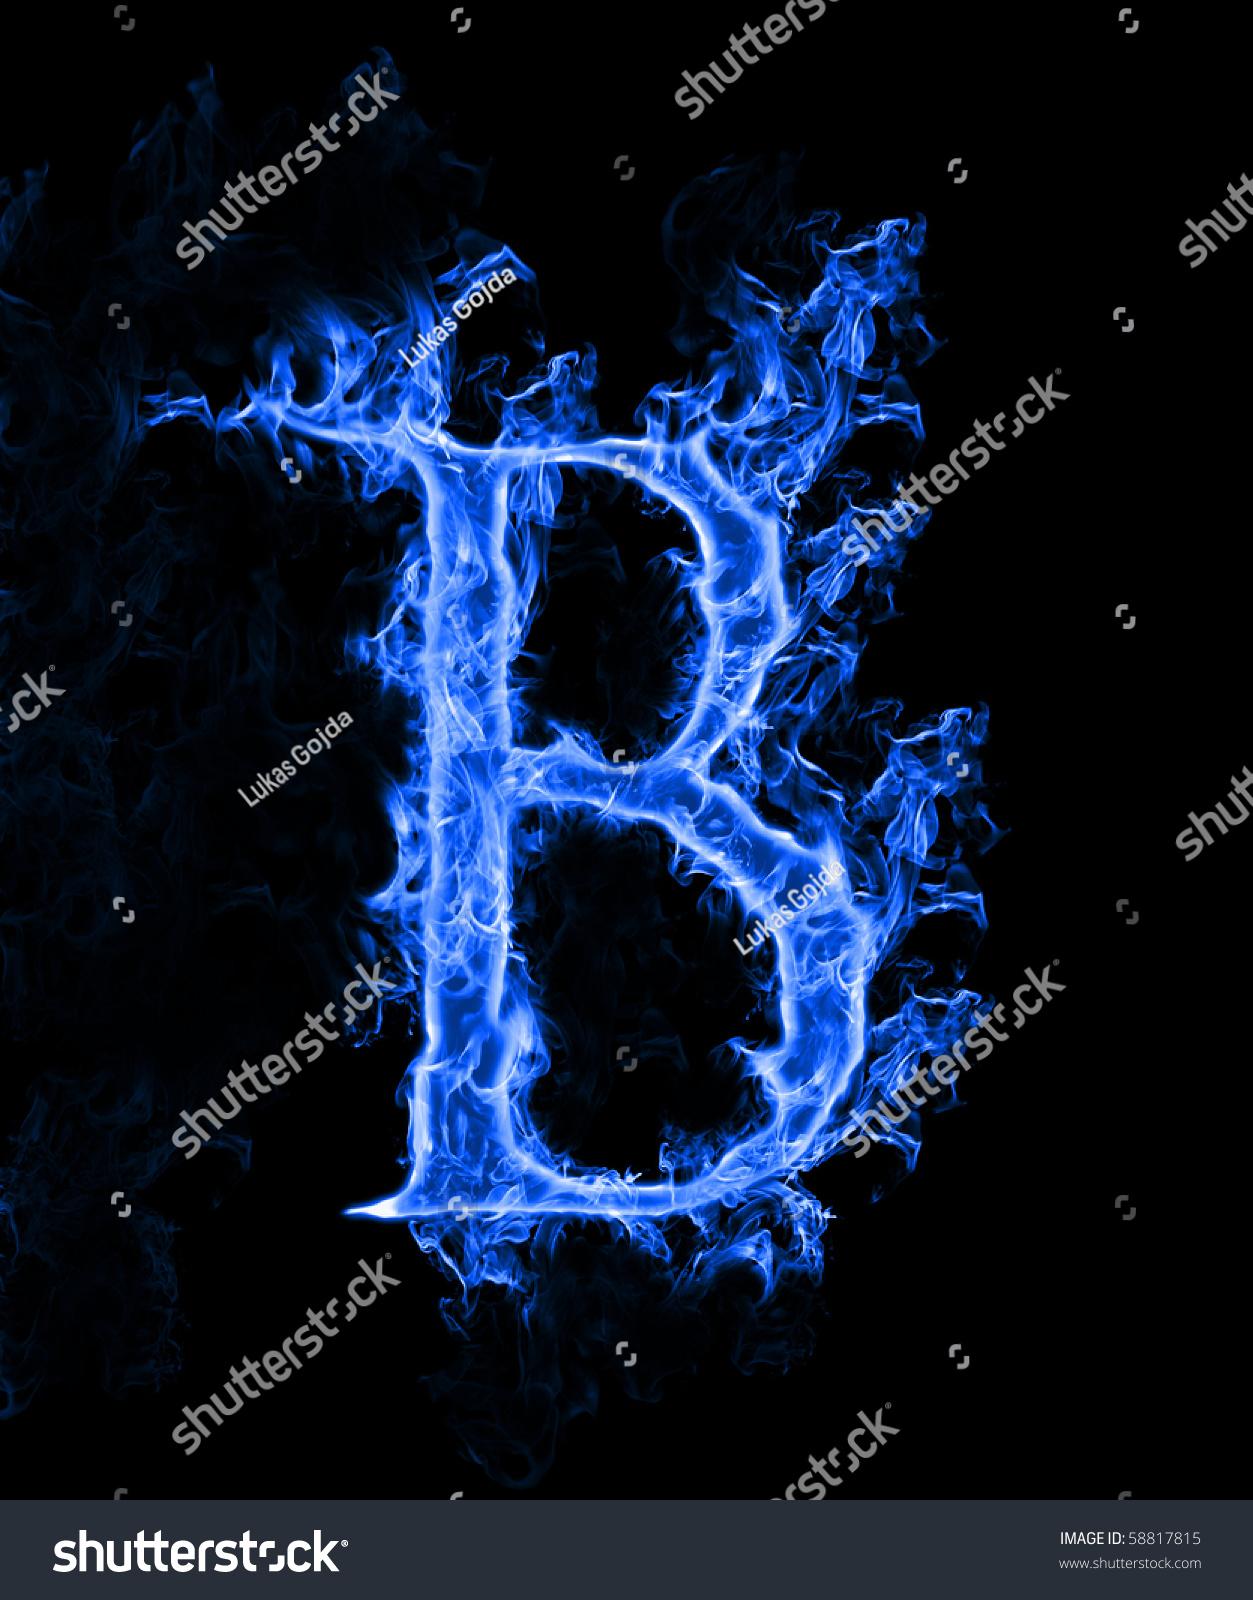 Blue Smoke Letter B Stock Photo 58817815 - Shutterstock